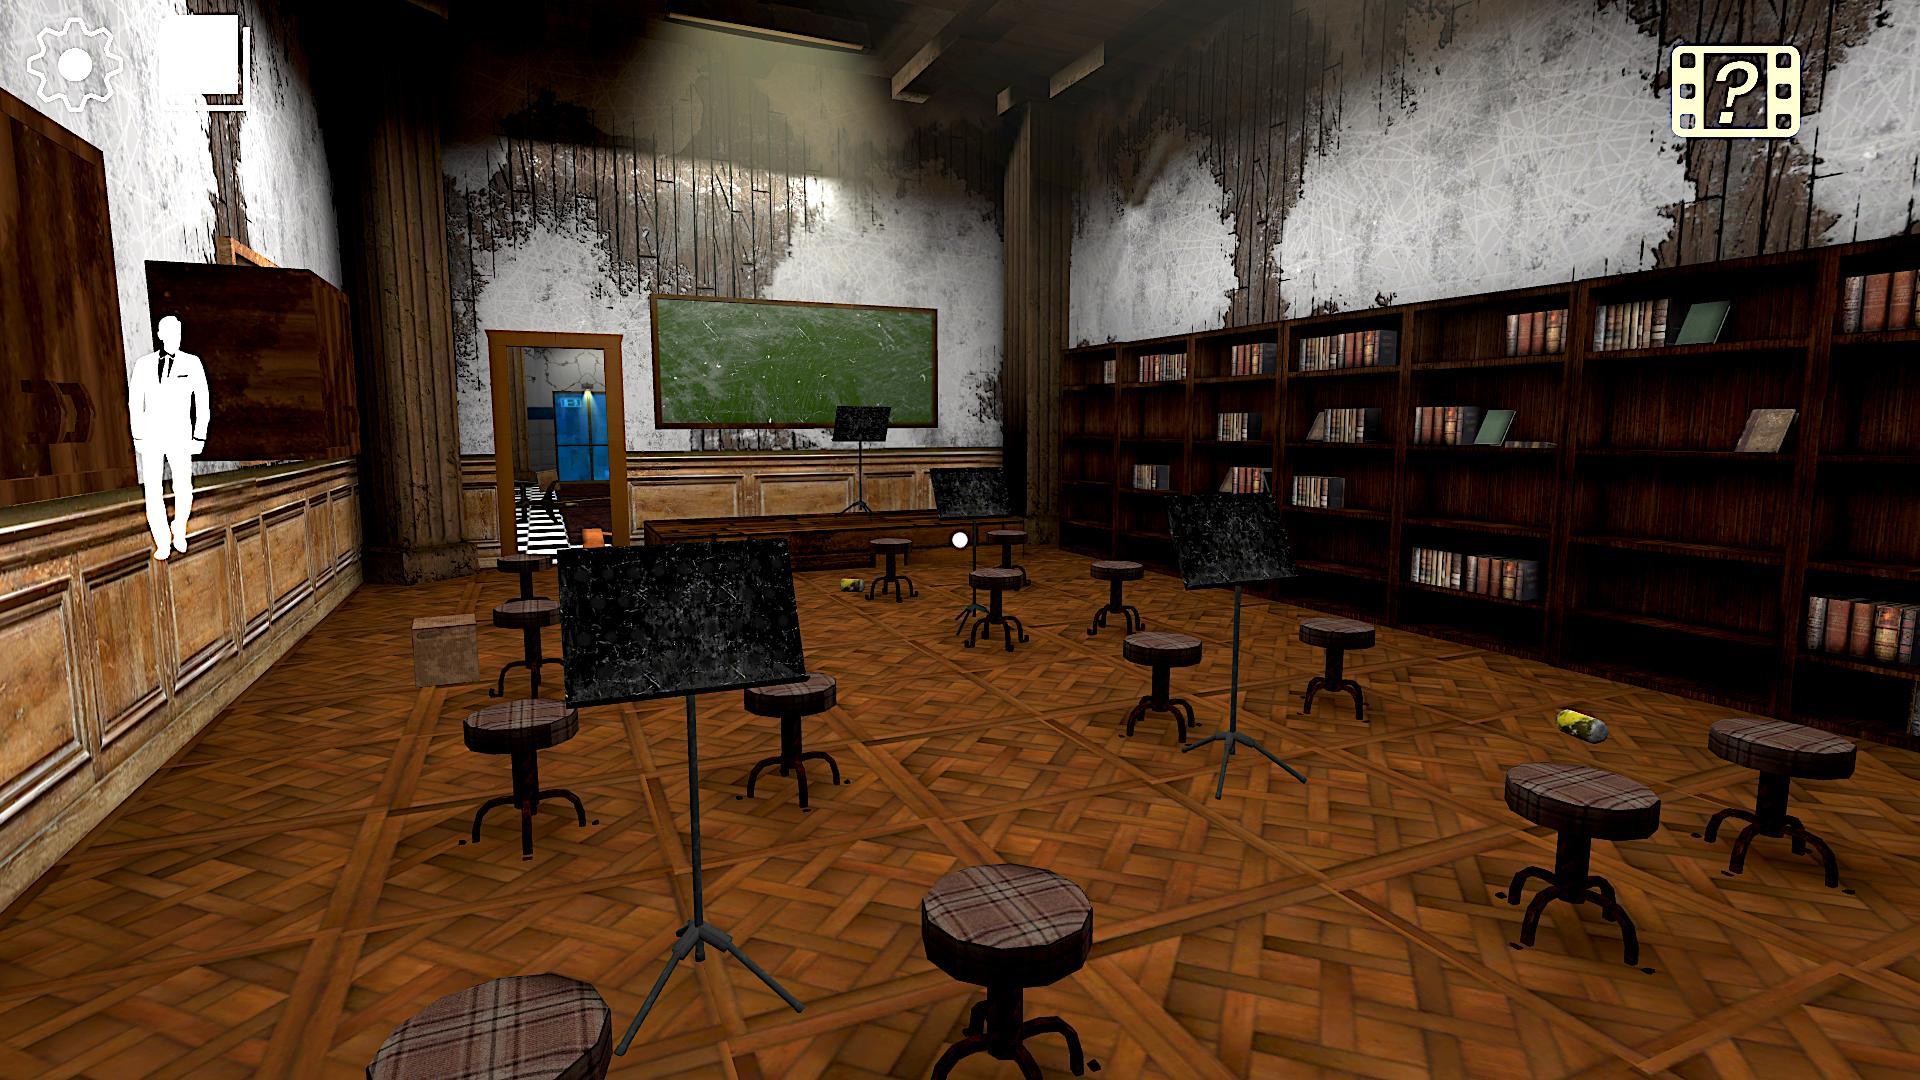 Evil Erich Sann : The New Horror Games. 2.5.0 Screenshot 21